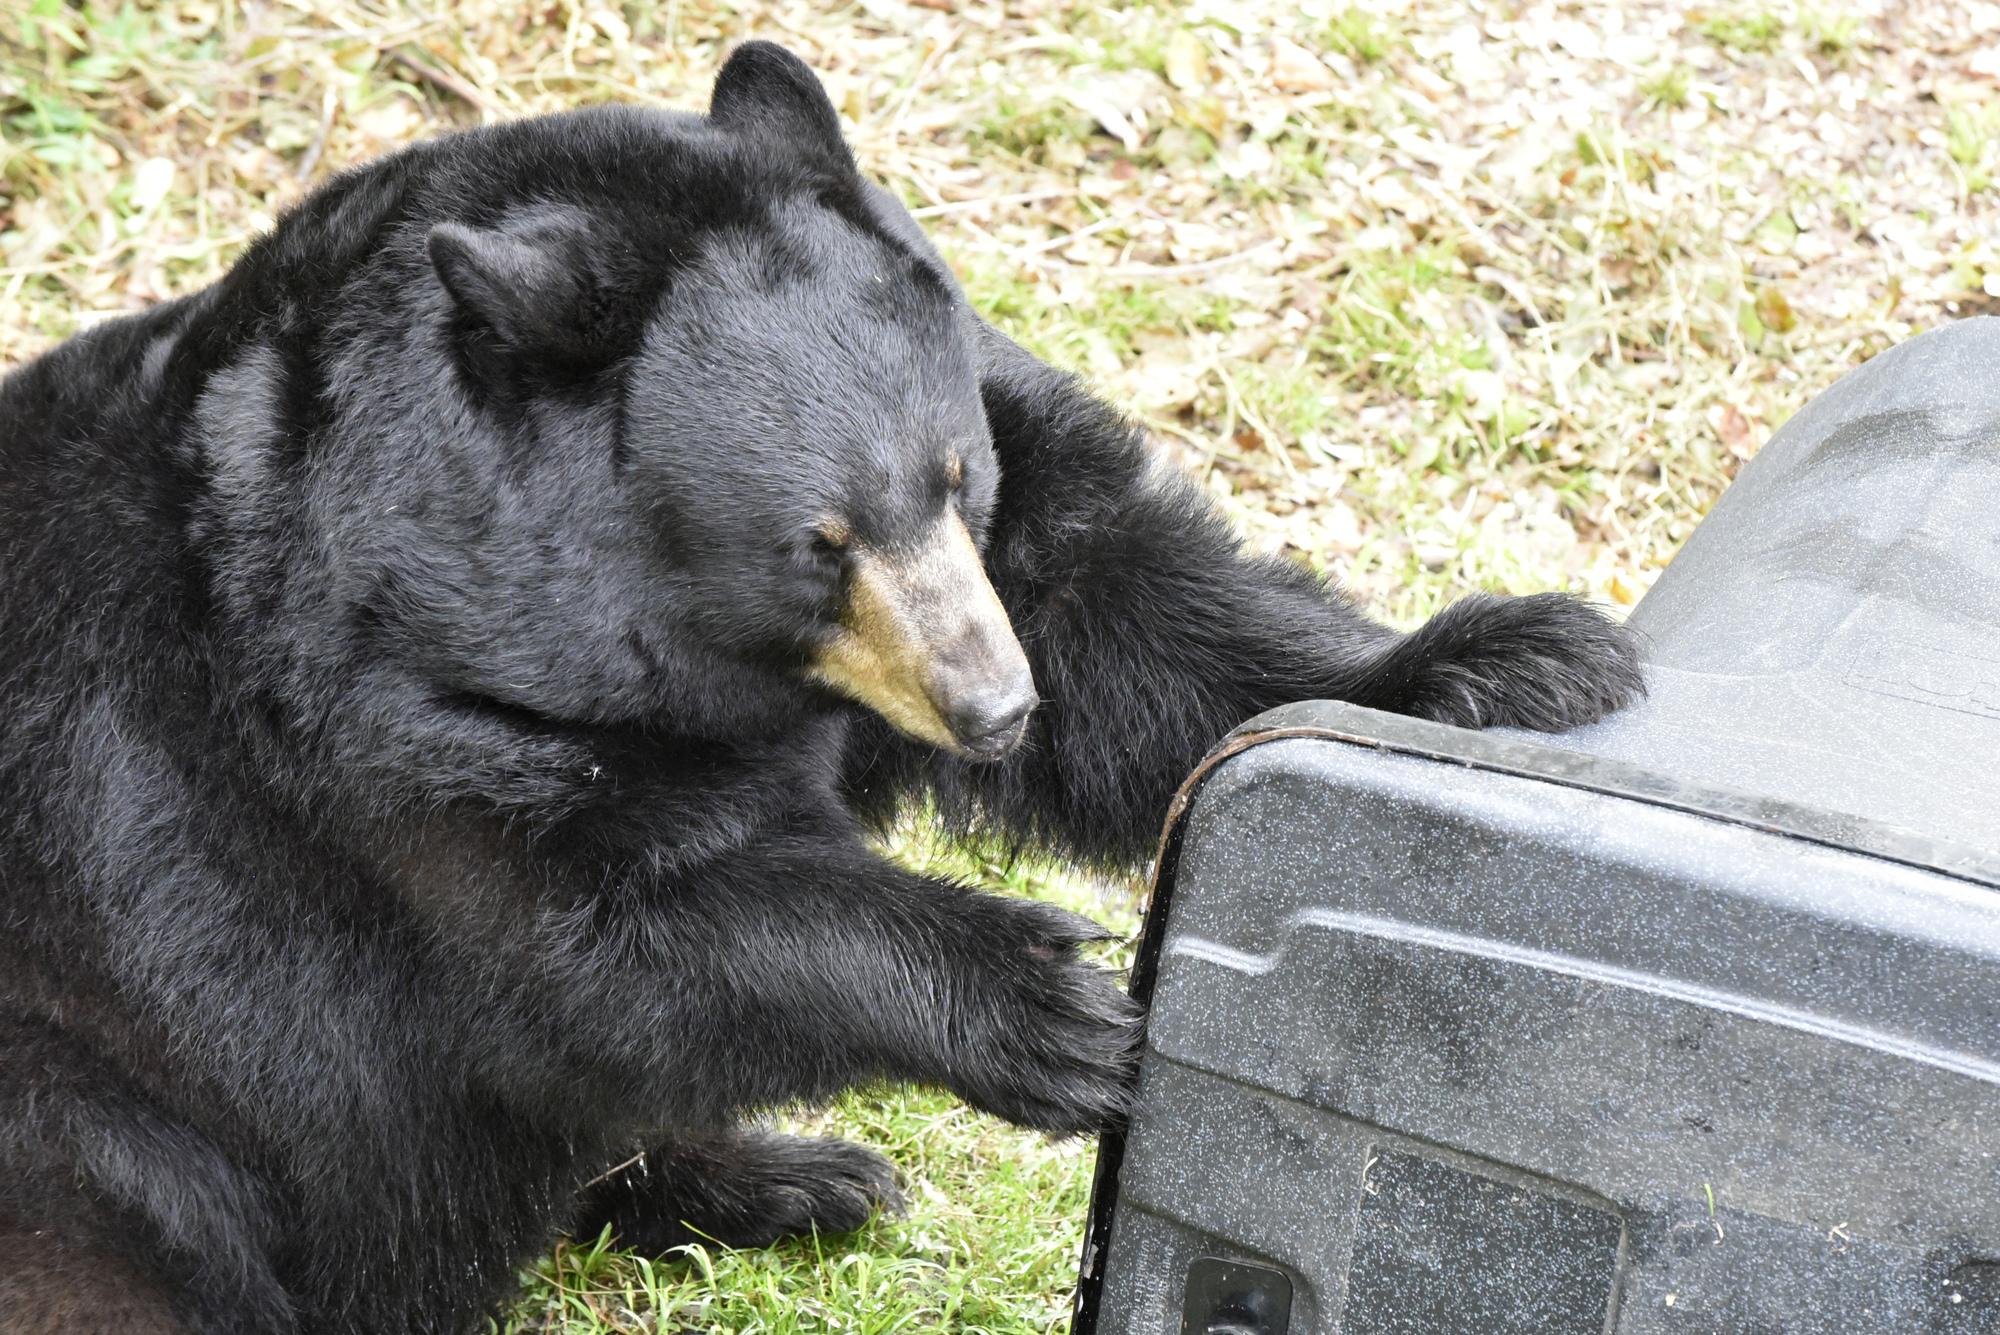 Springtime Spurs Activity For Florida Black Bears